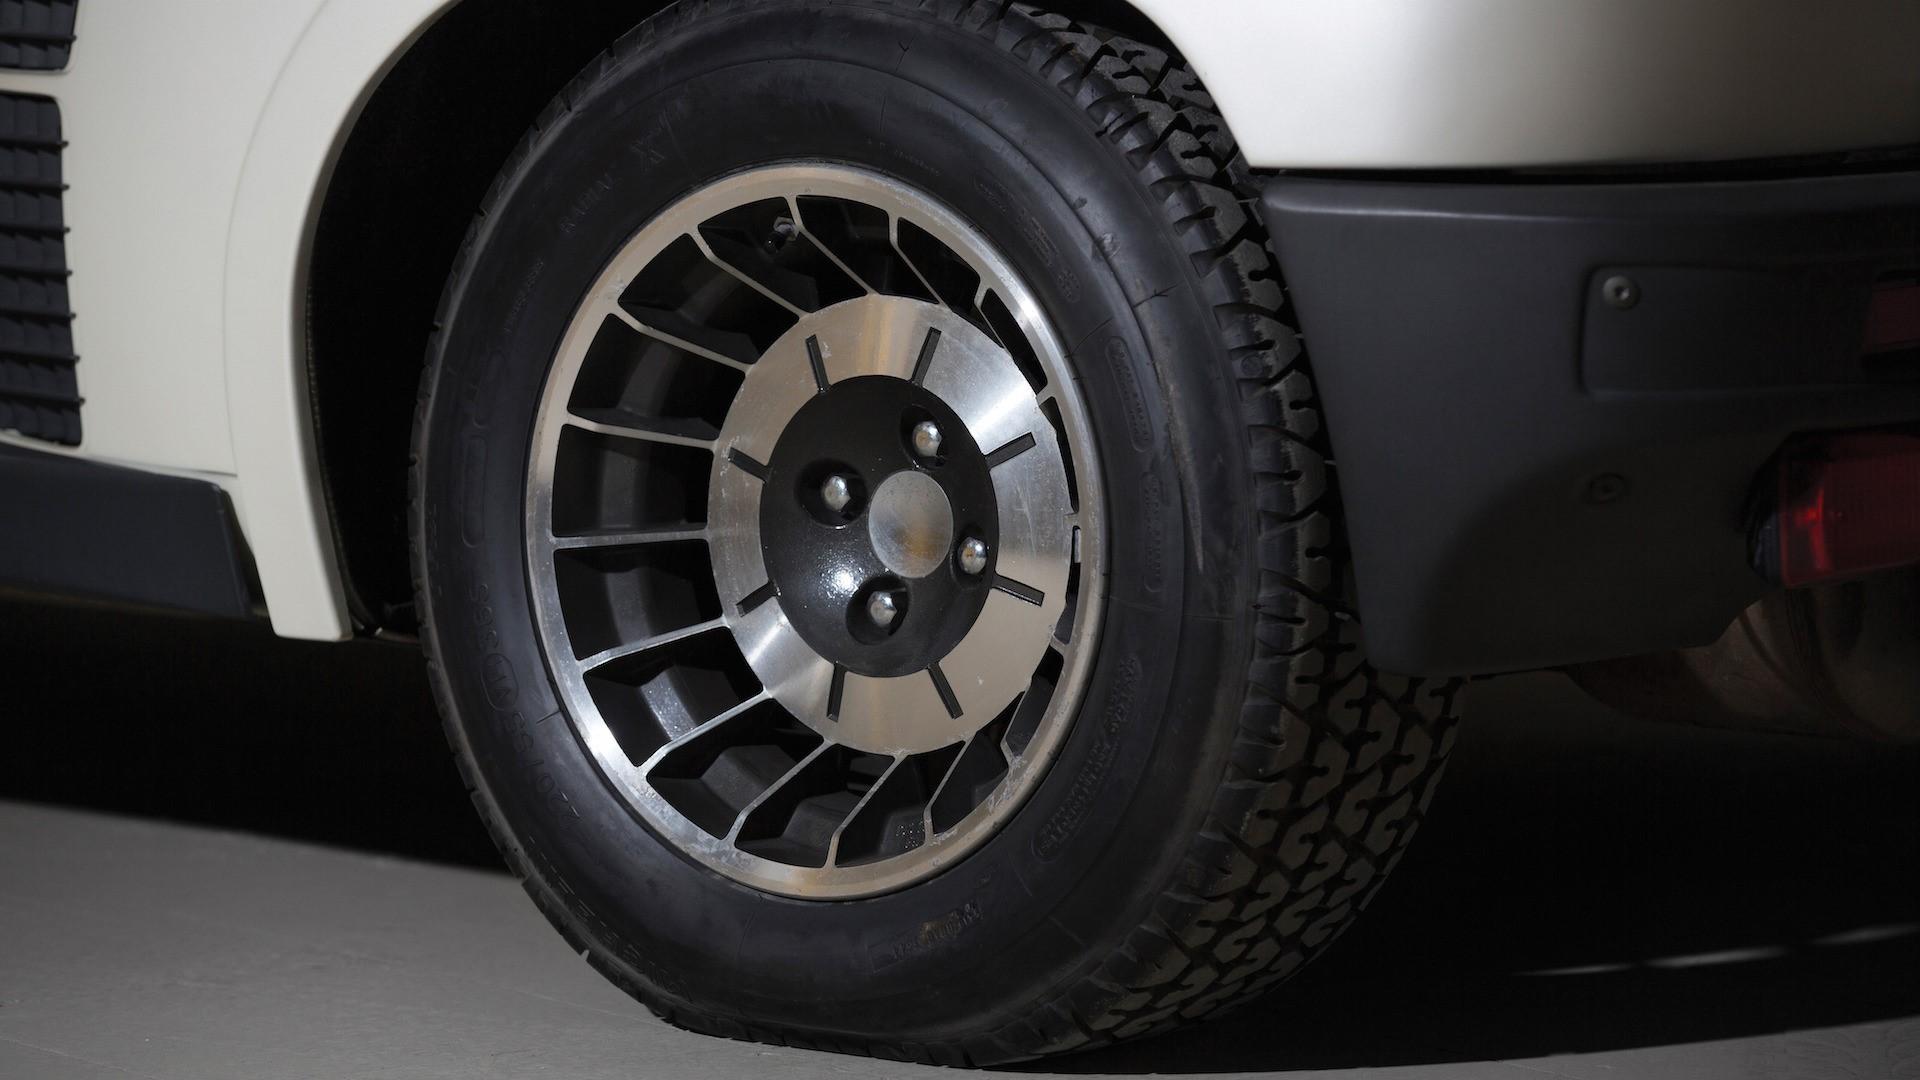 1983-renault-5-turbo-ii-auction (8)